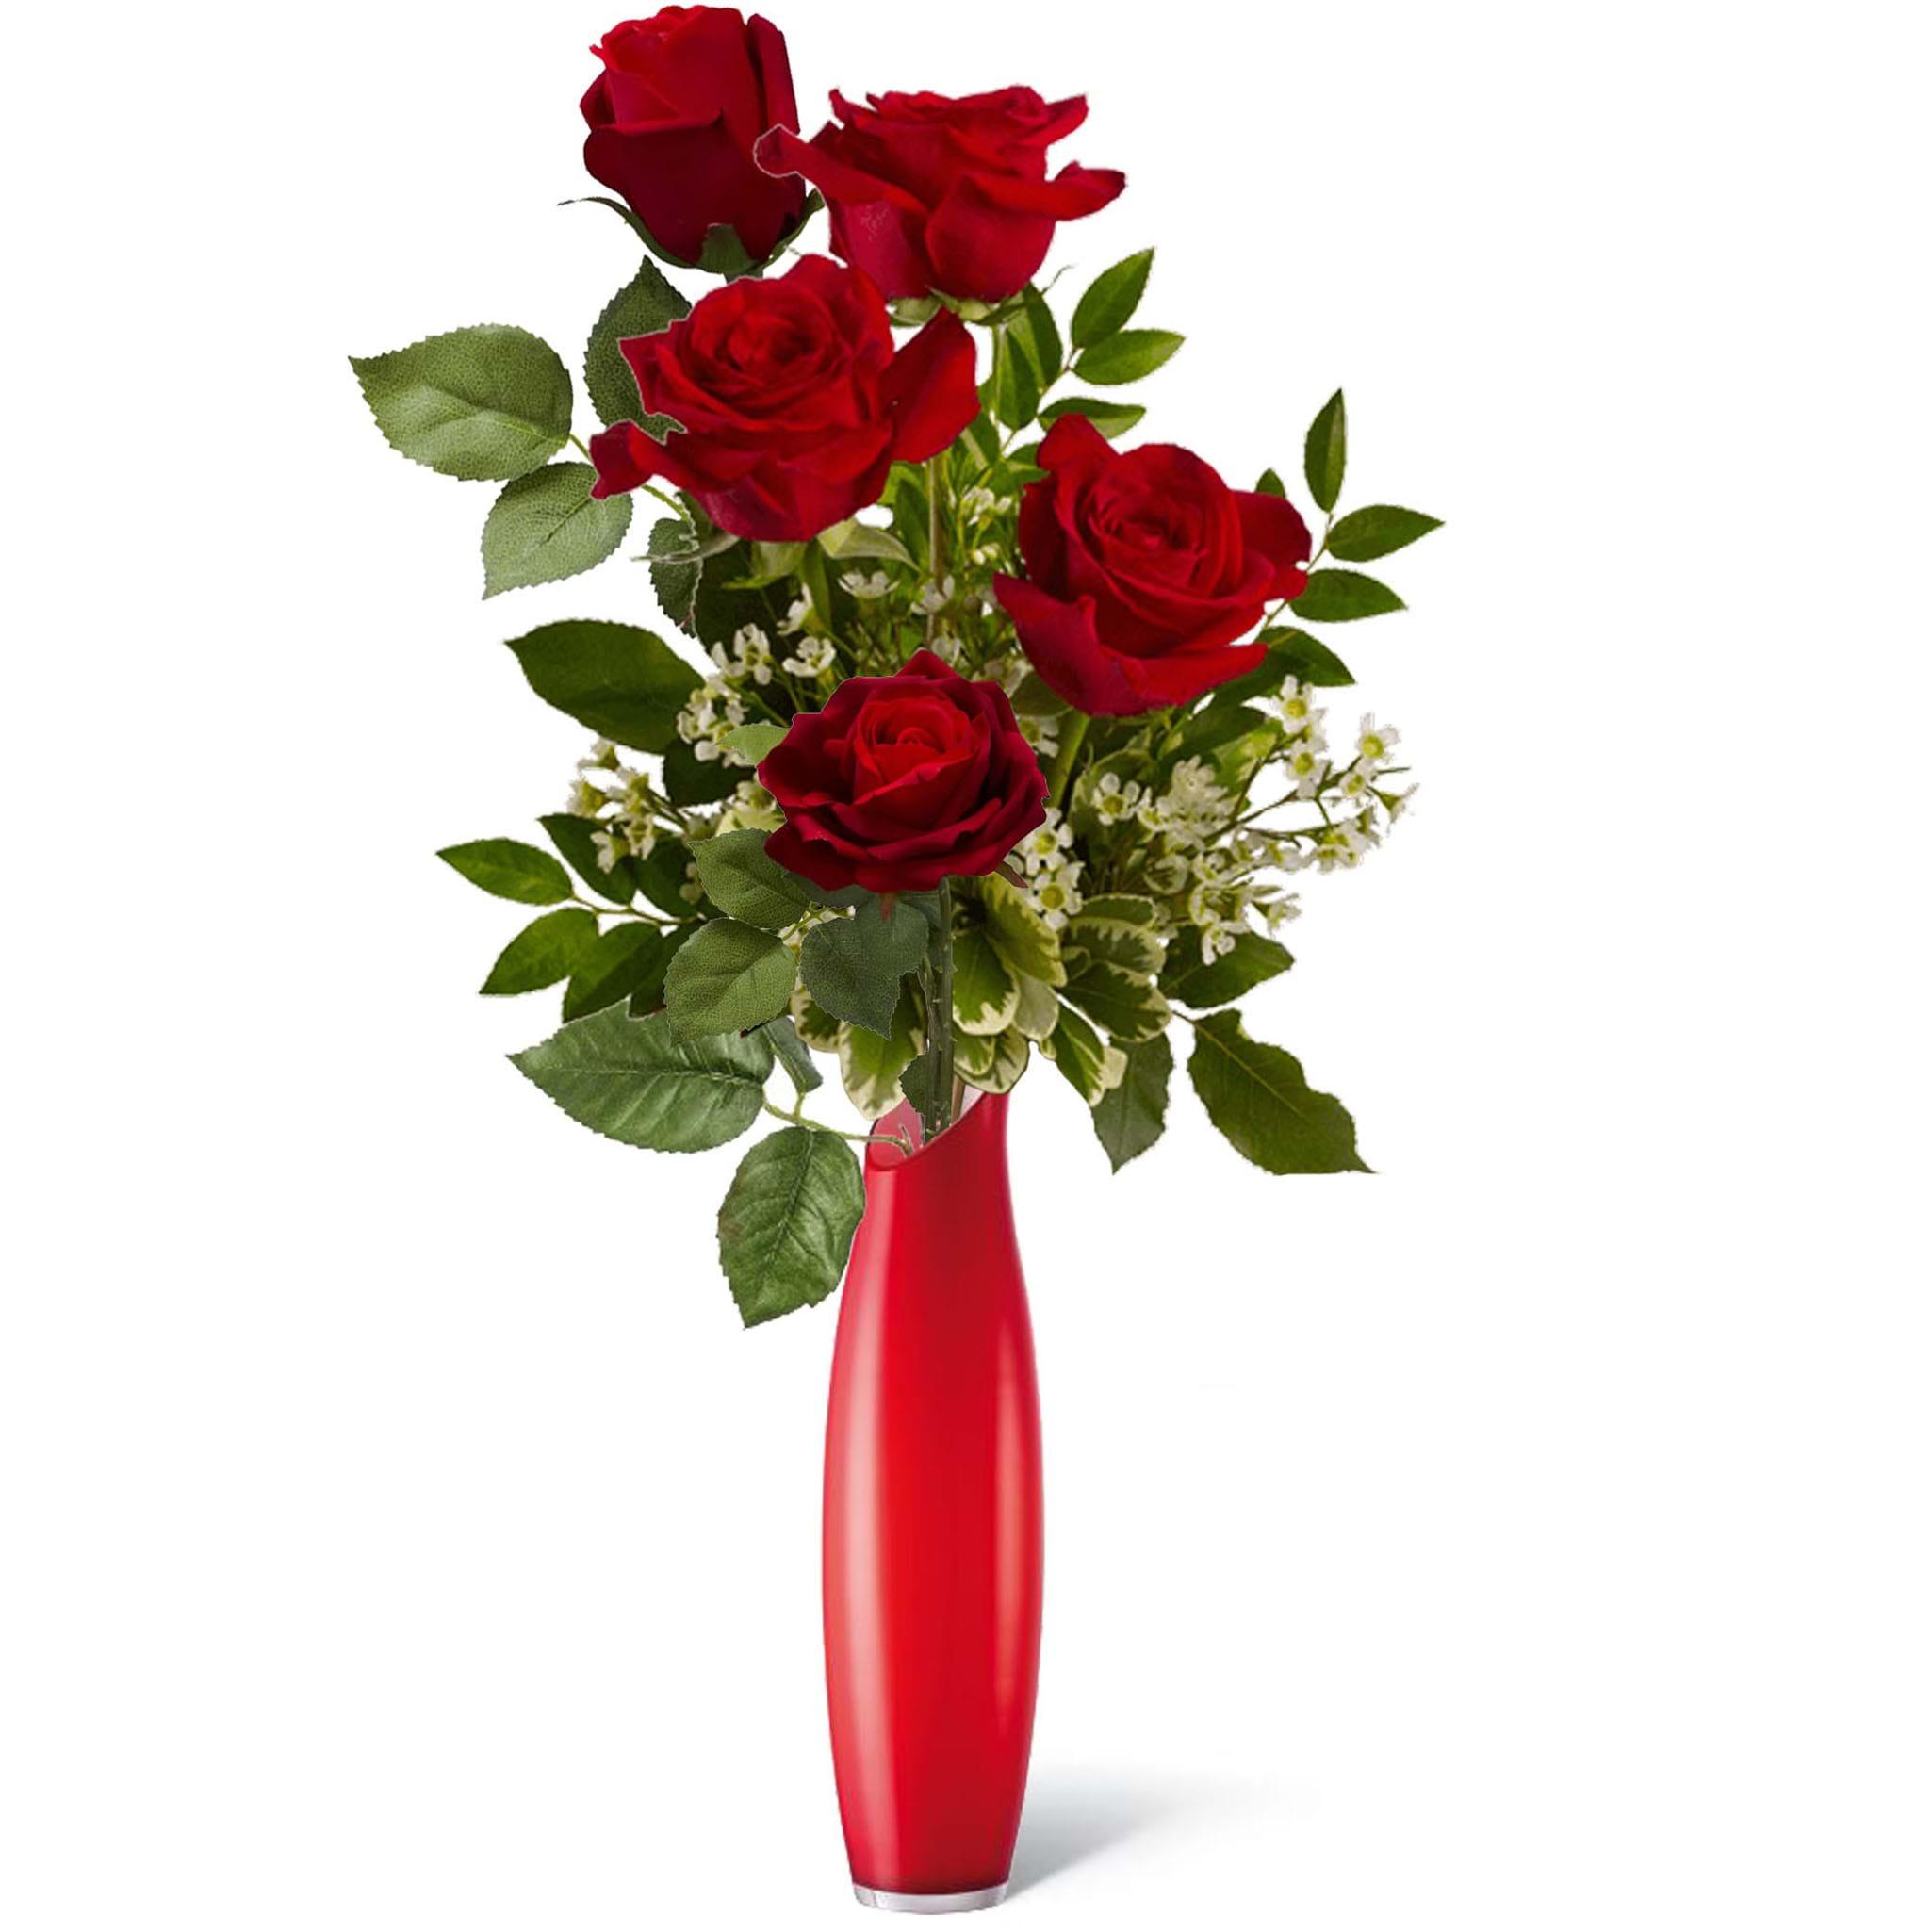 Spedire mazzo di 5 rose rosse in vaso rosso